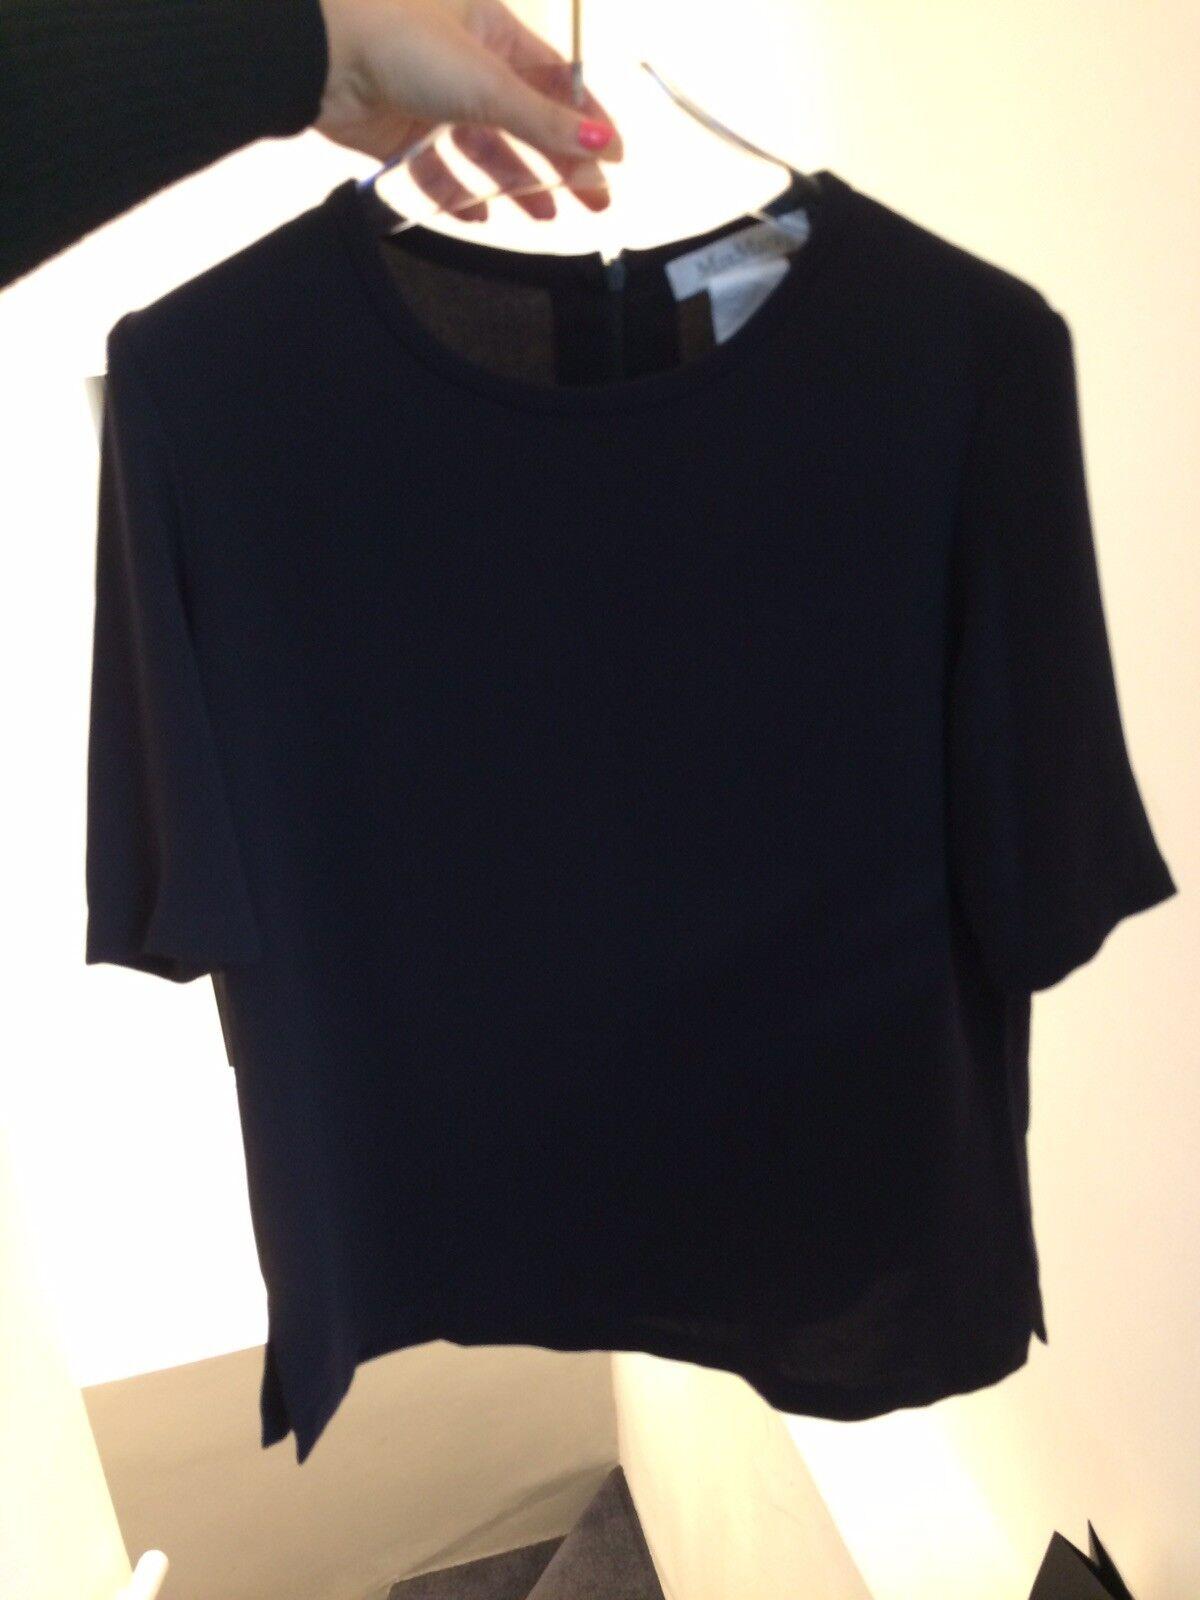 Max Mara schwarz Top, Max Mara Short Sleeve Top, schwarz Top, Größe 6 UK